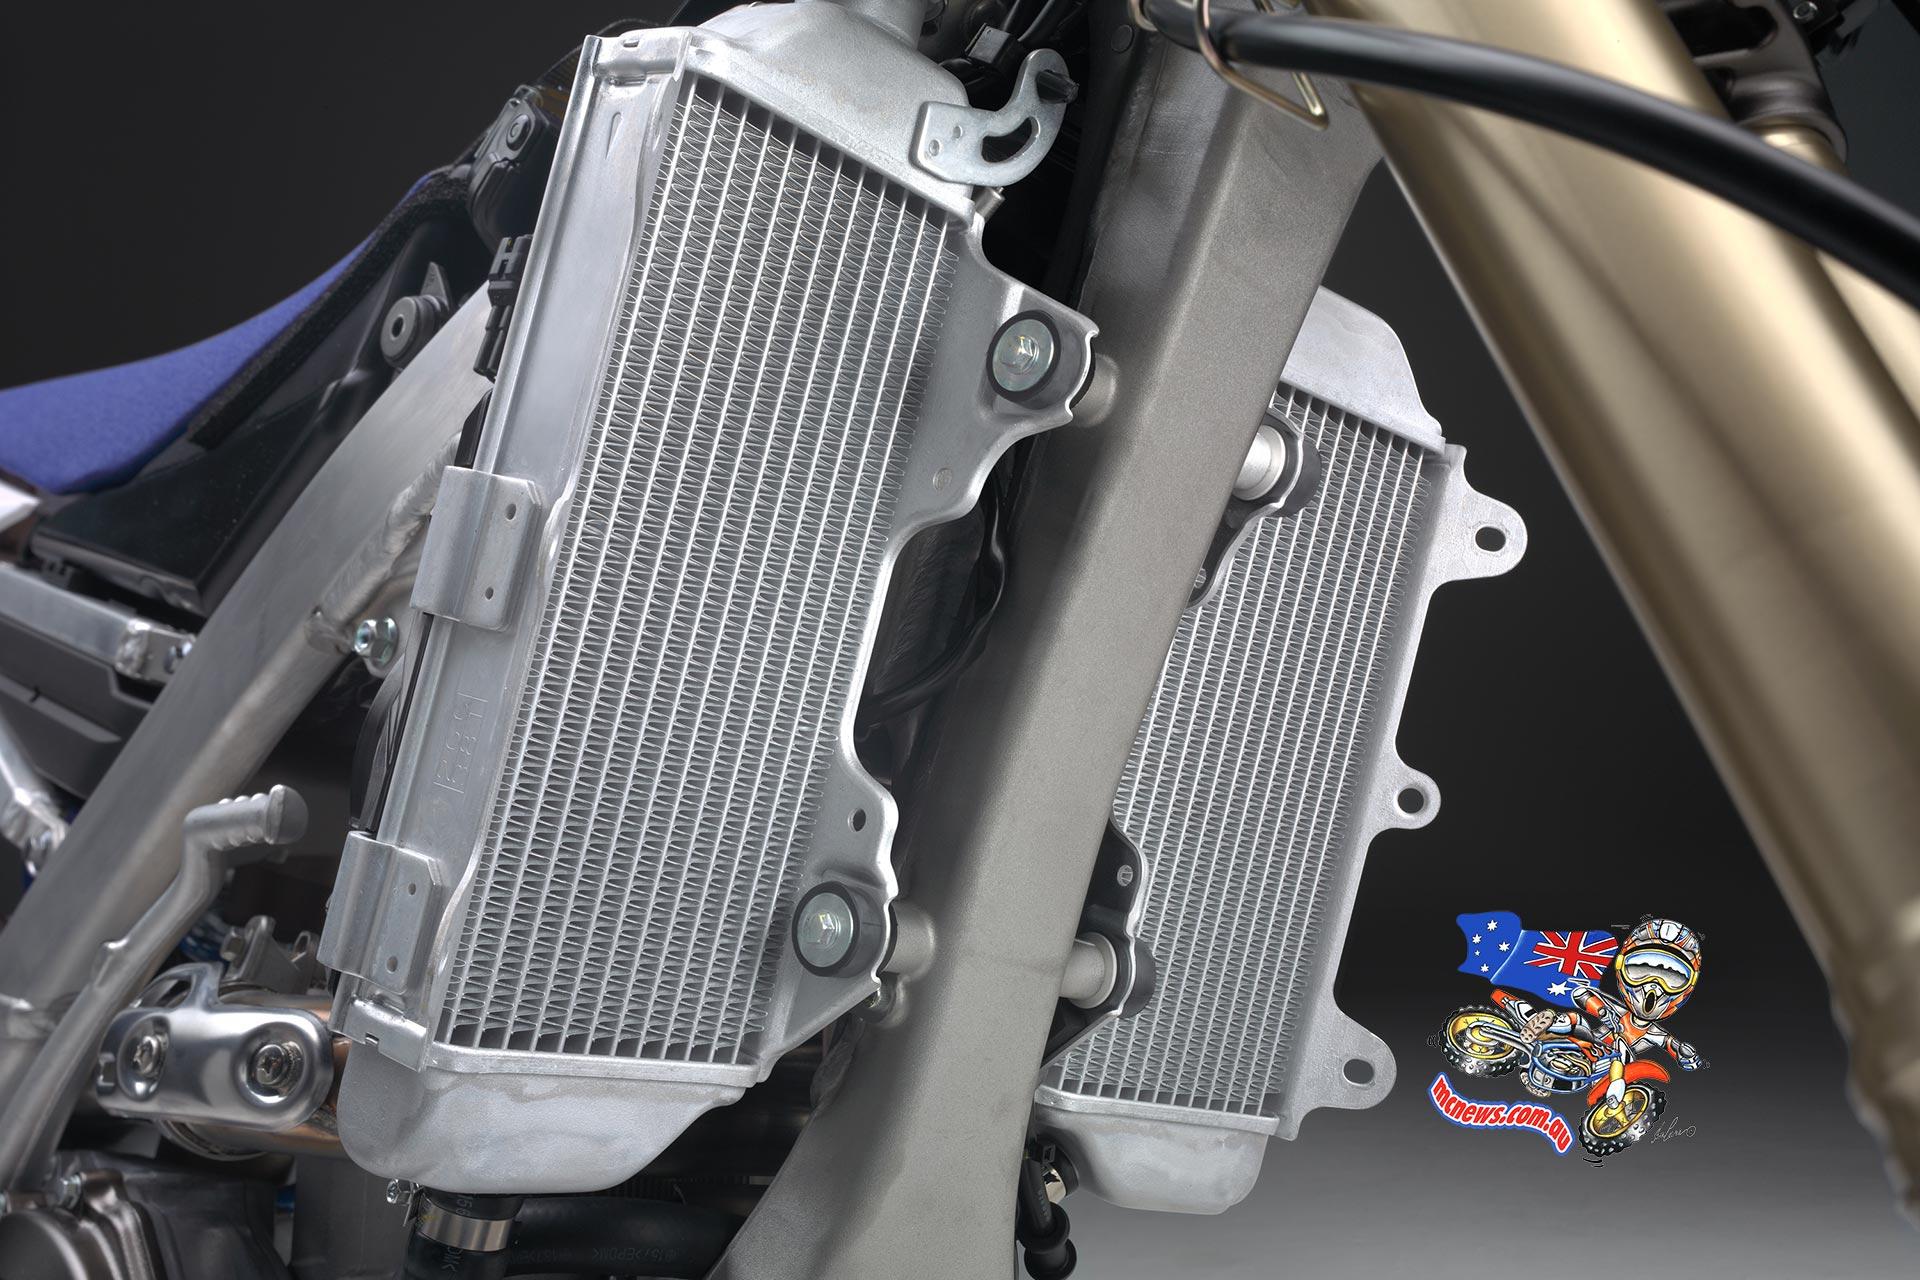 All New Yamaha Wr450f Revealed Wiring Diagram 2016